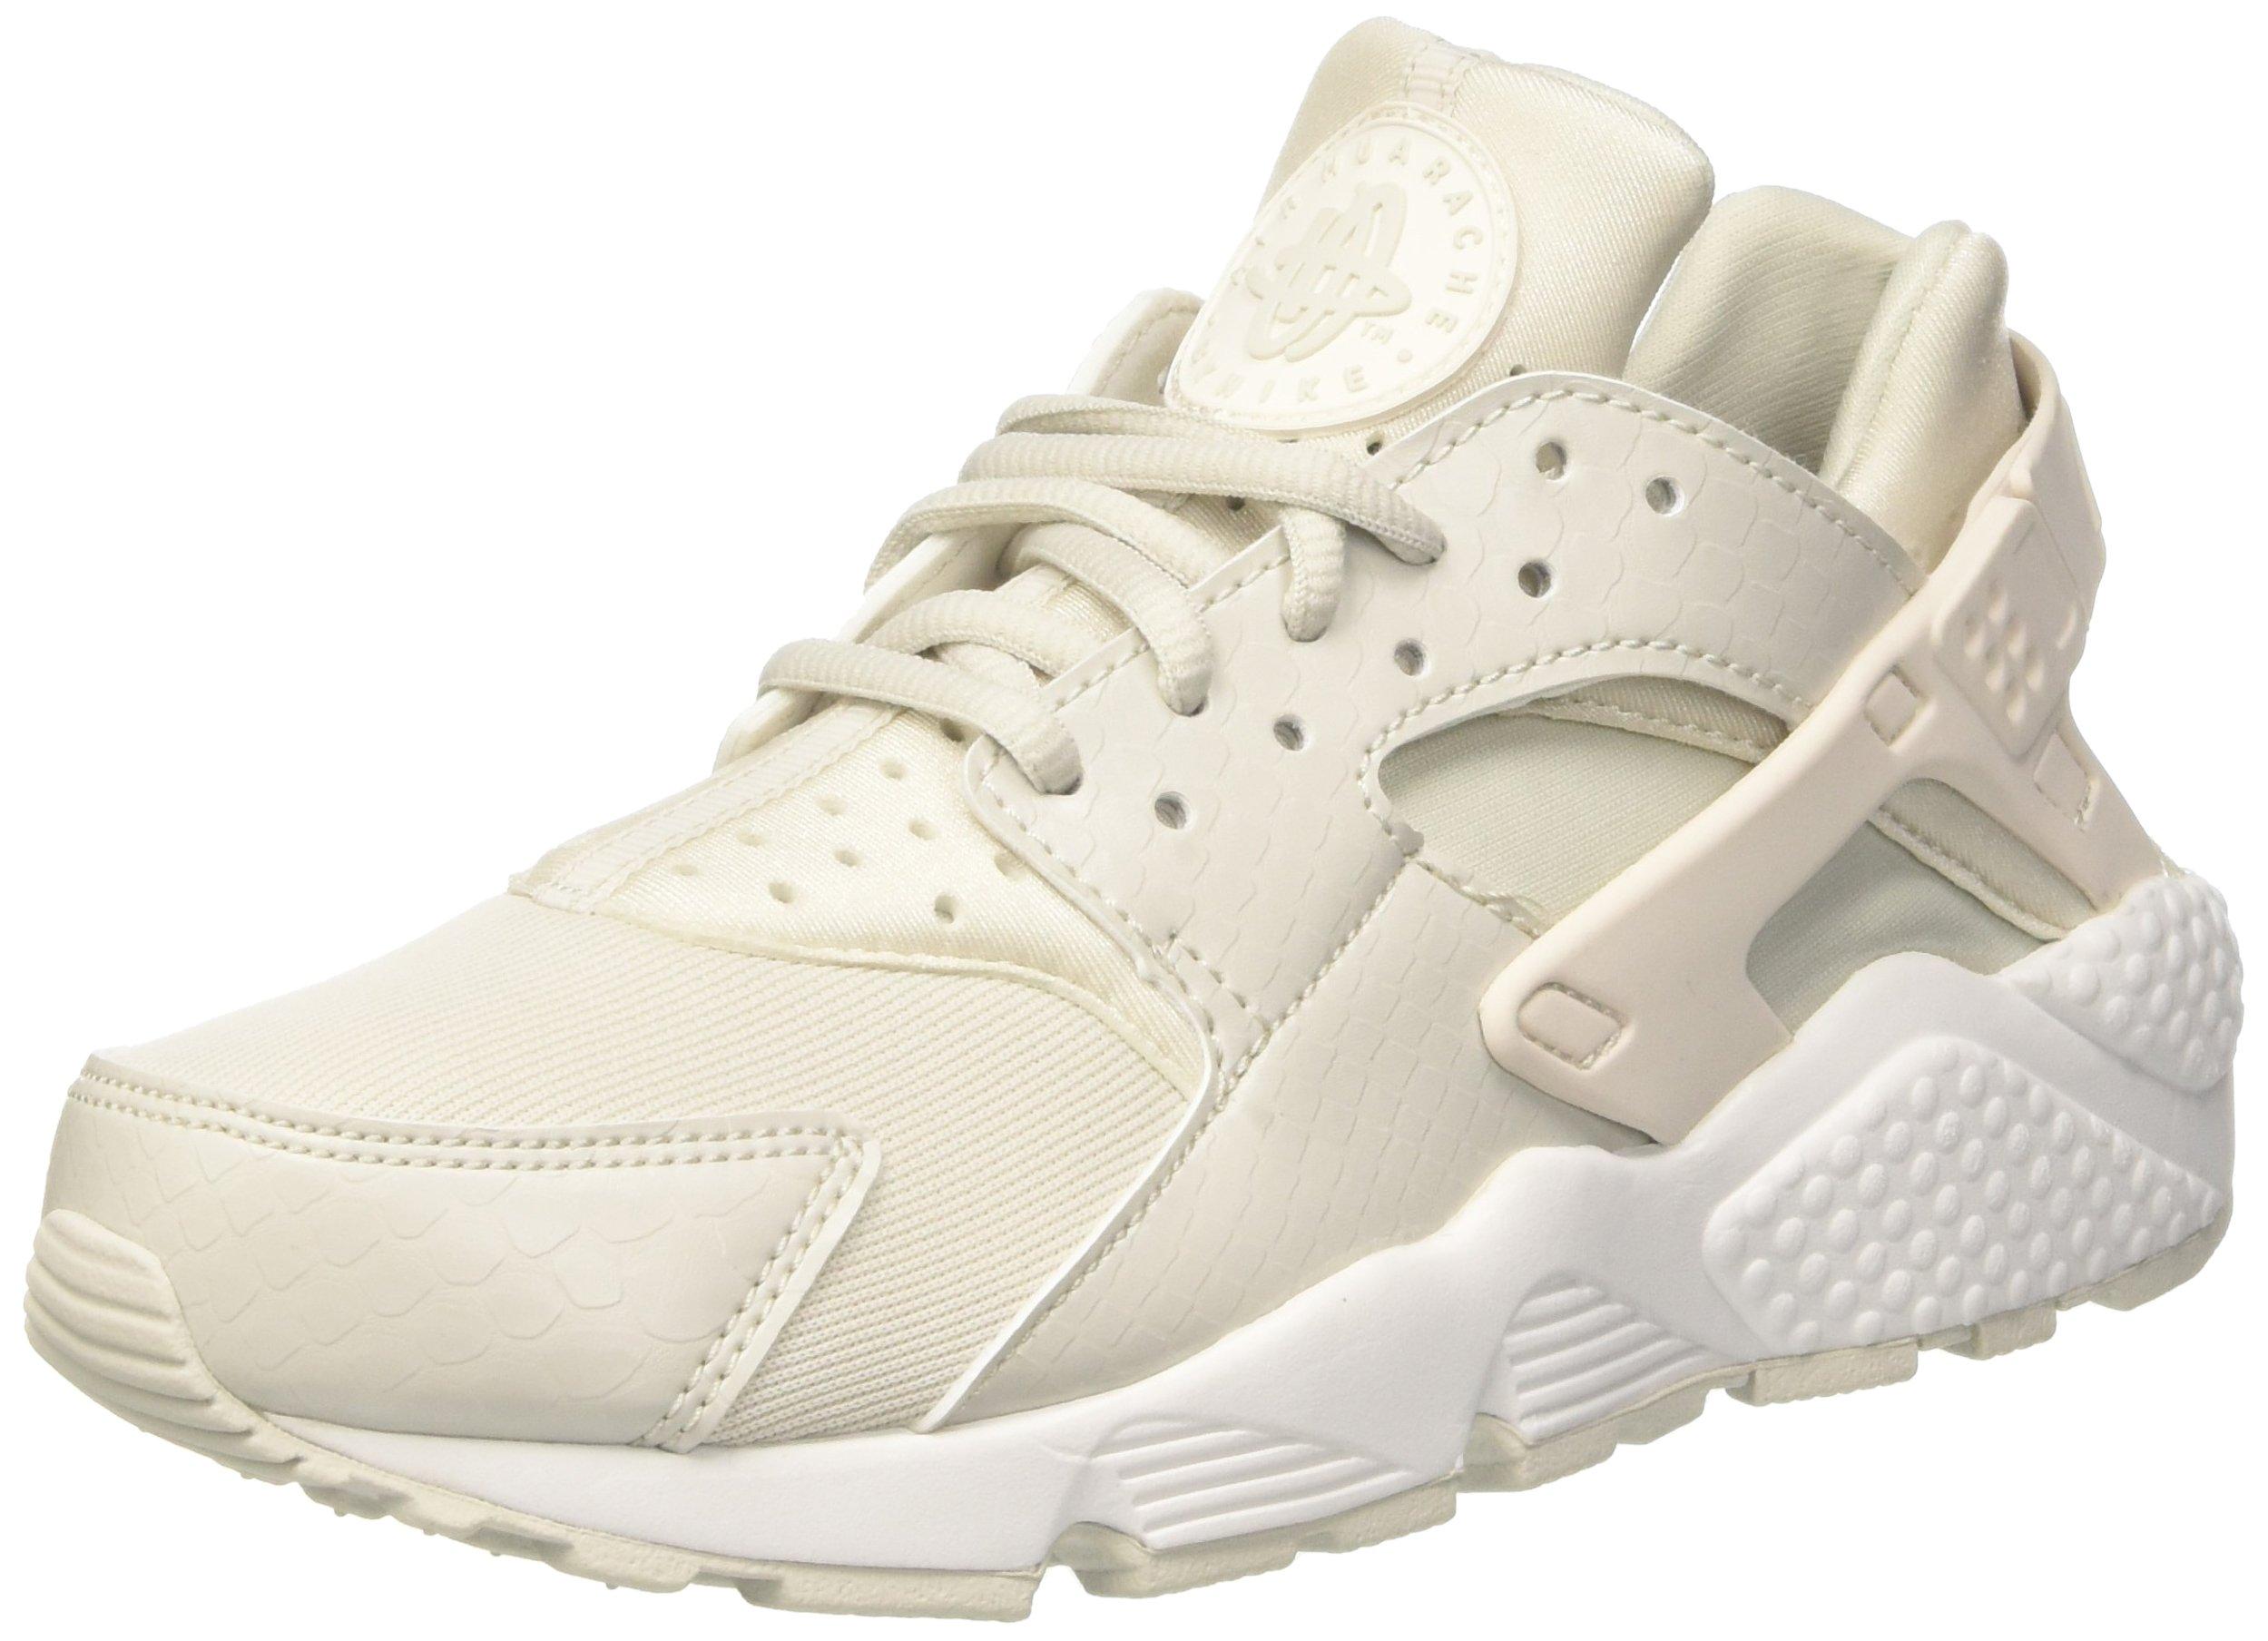 d6dce0a9113d Galleon - Nike Air Huarache Run Women s Running Shoes Phantom Light Bone  634835-028 (6 B(M) US)